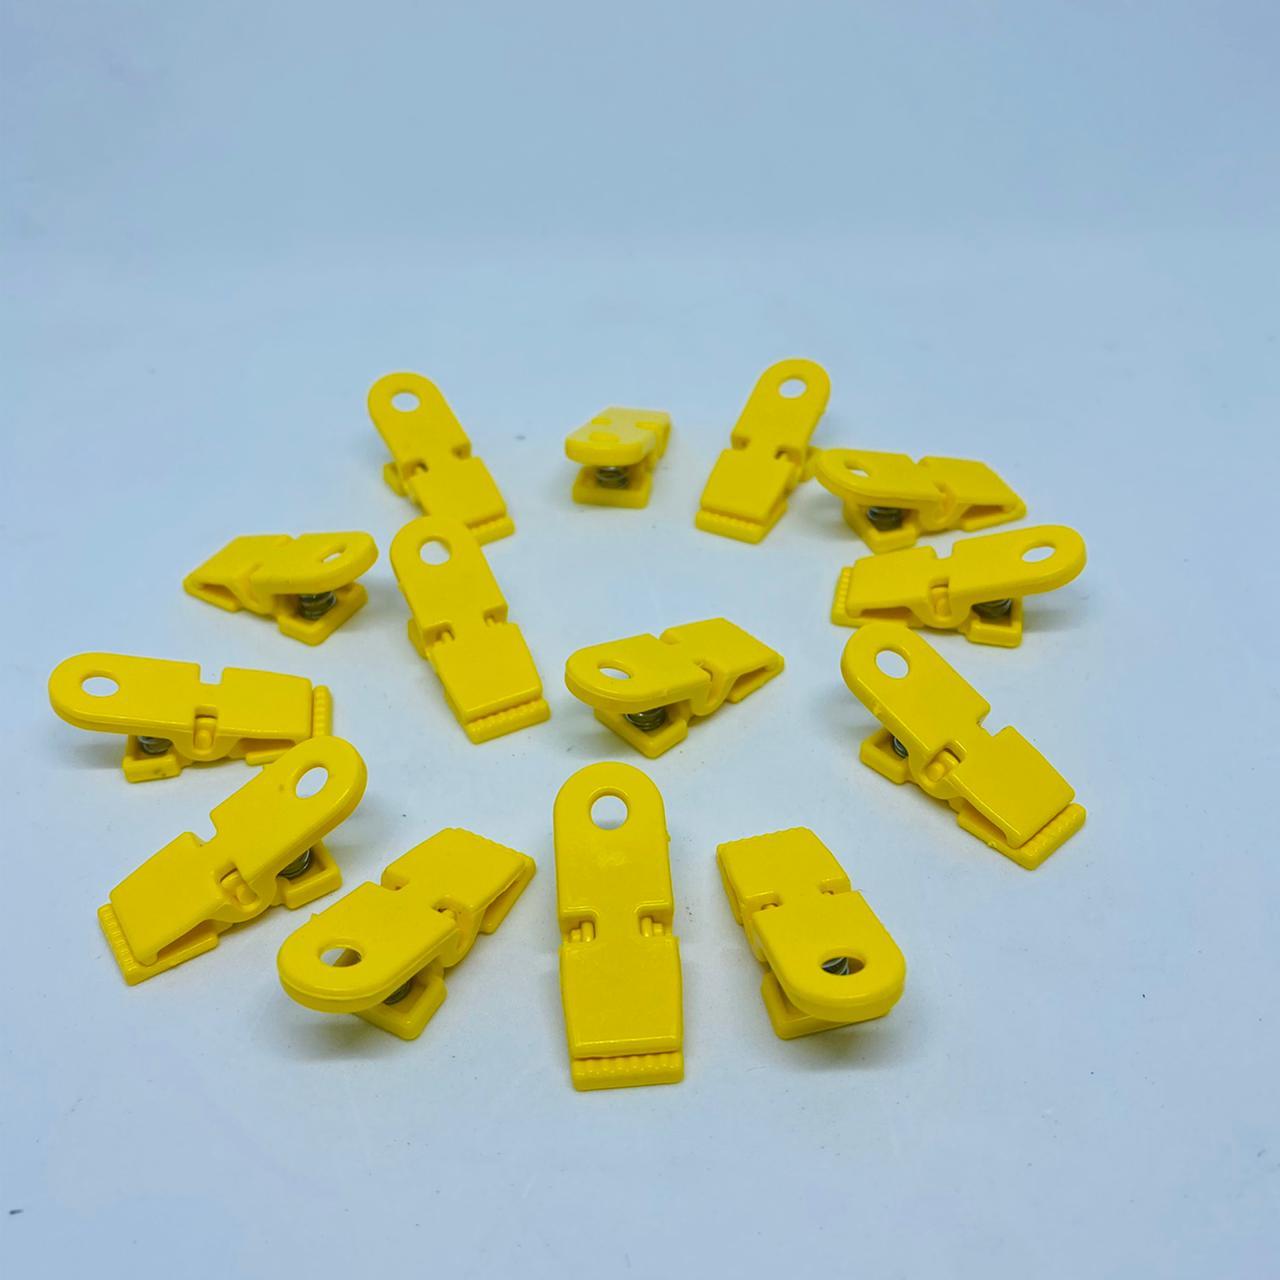 Prendedor de chupeta amarelo